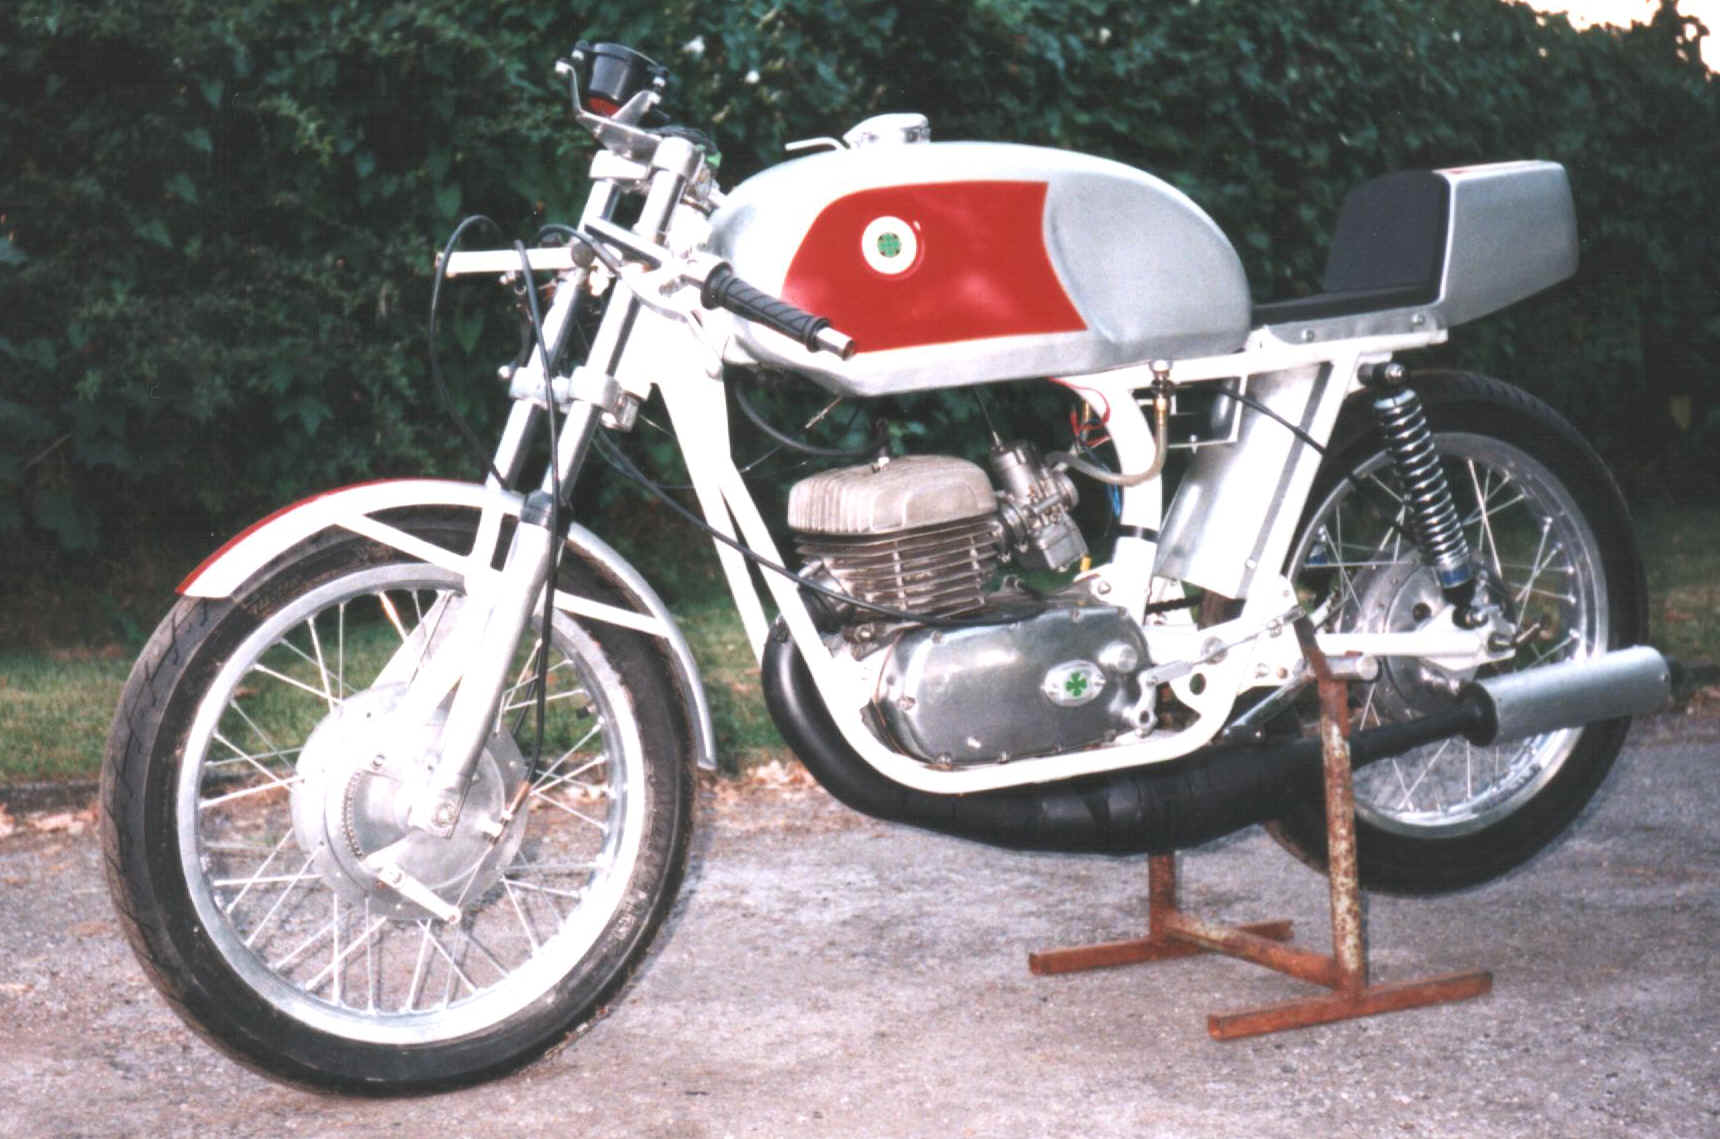 MotoCarStyle LewisportUSA, OSSA Trials Motorcycles